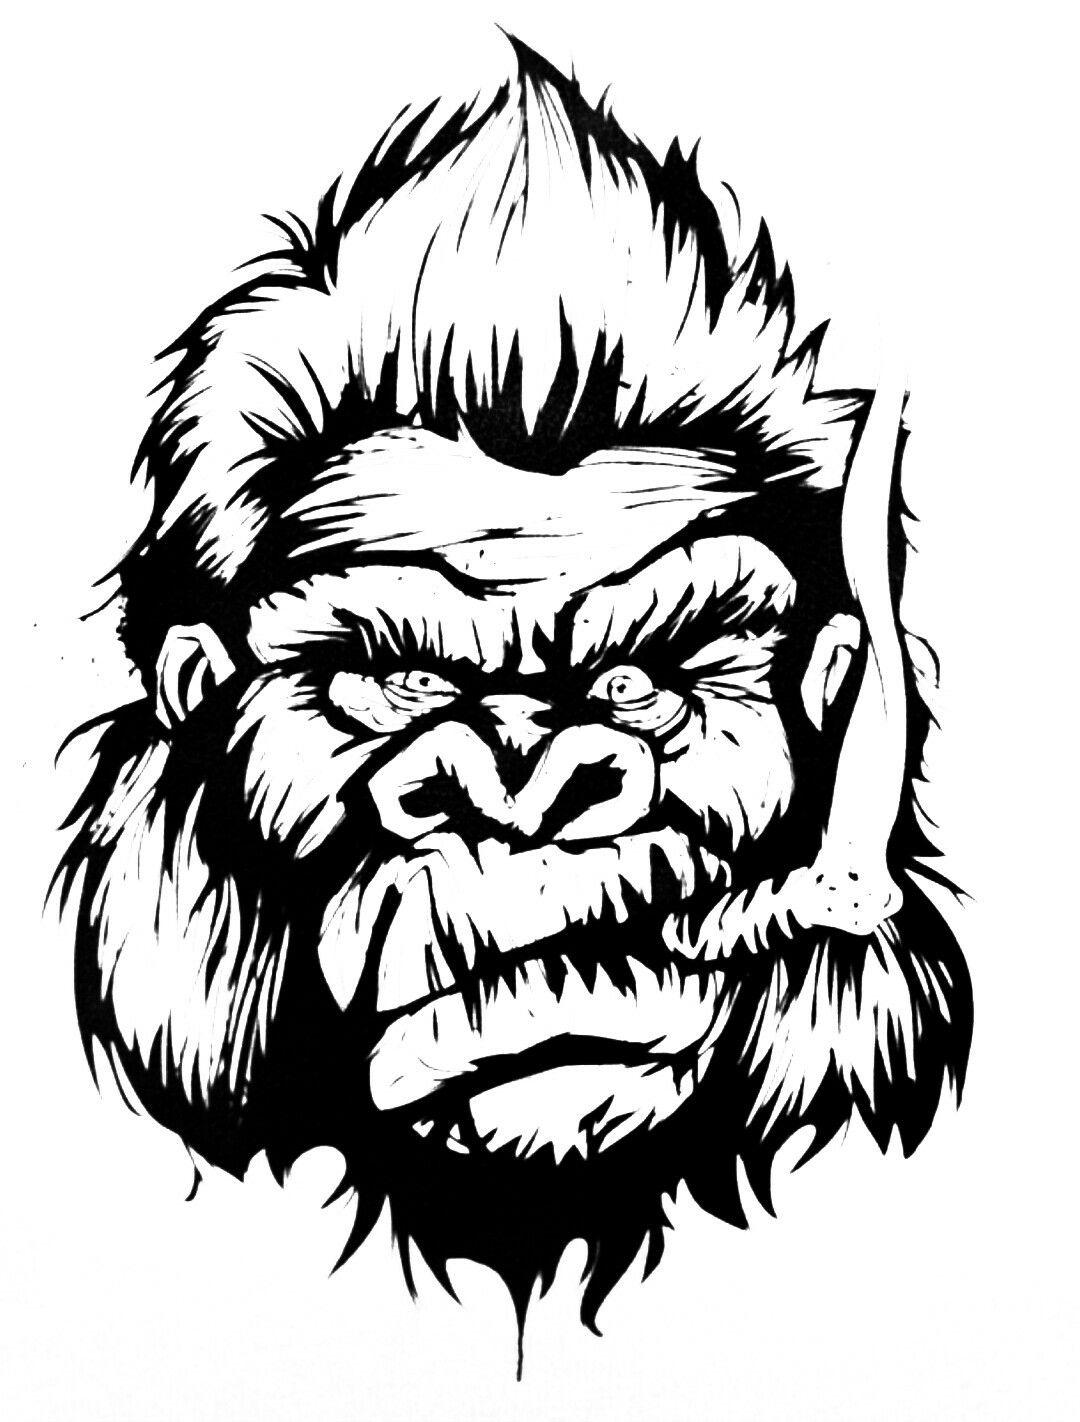 Gorilla Face In